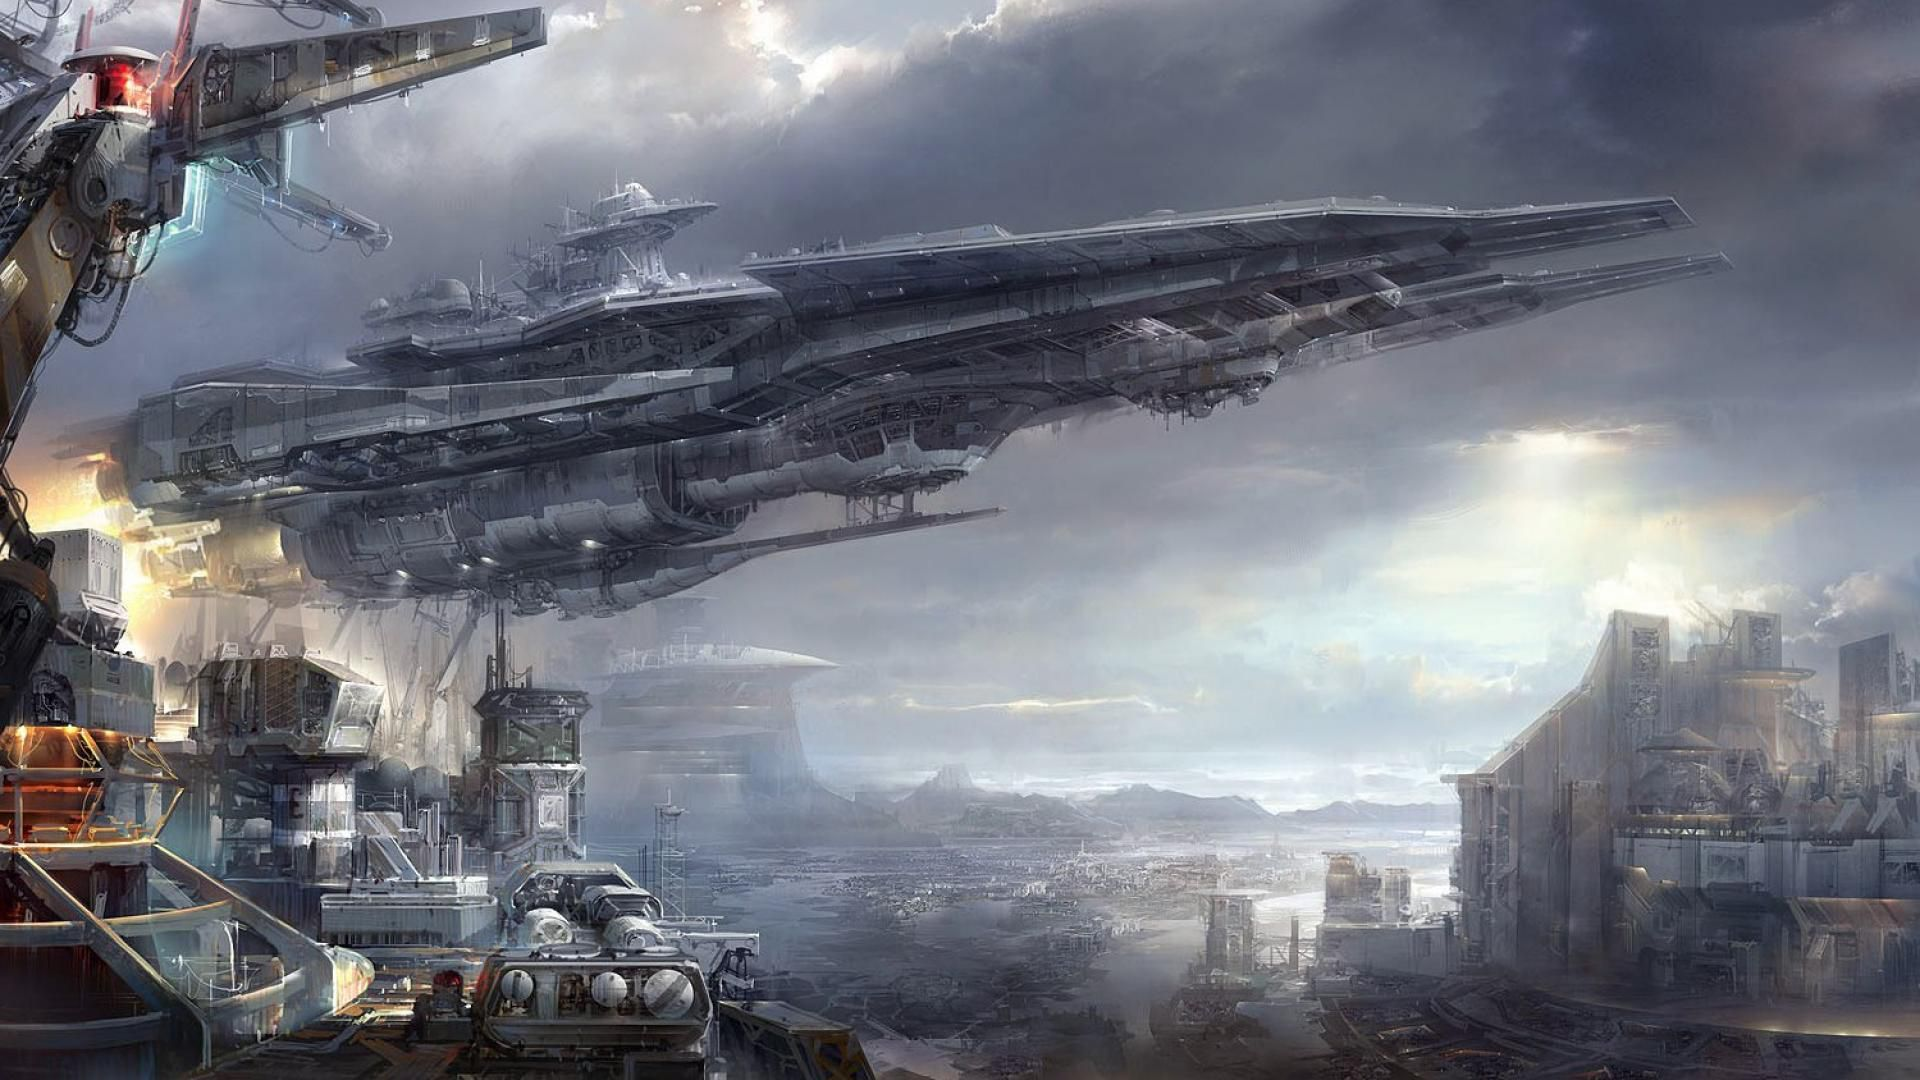 951 Spaceship Wallpapers Spaceship Backgrounds Spaceship Art